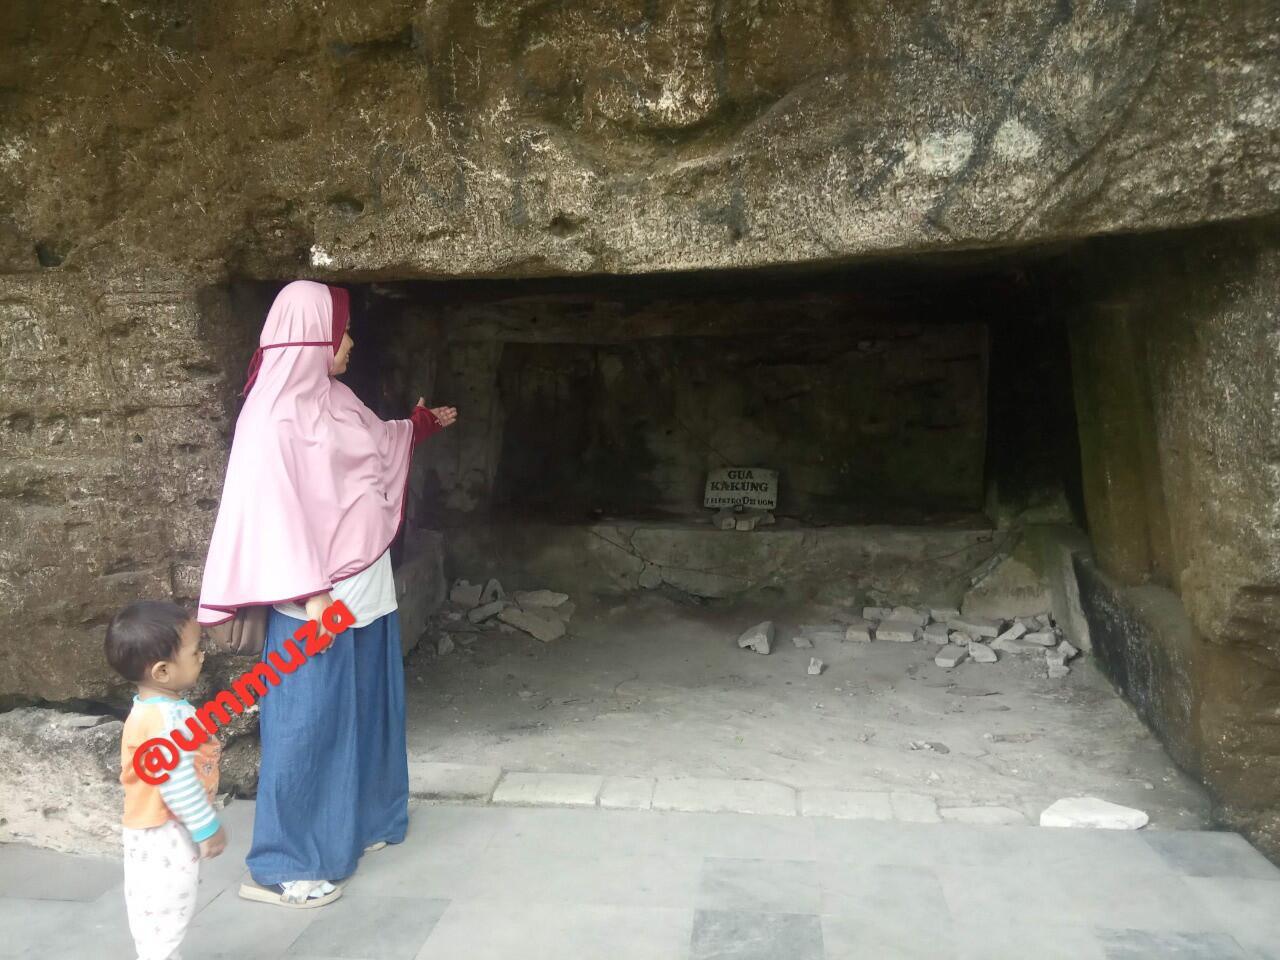 Goa Selarong, Napak Tilas Pangeran Diponegoro